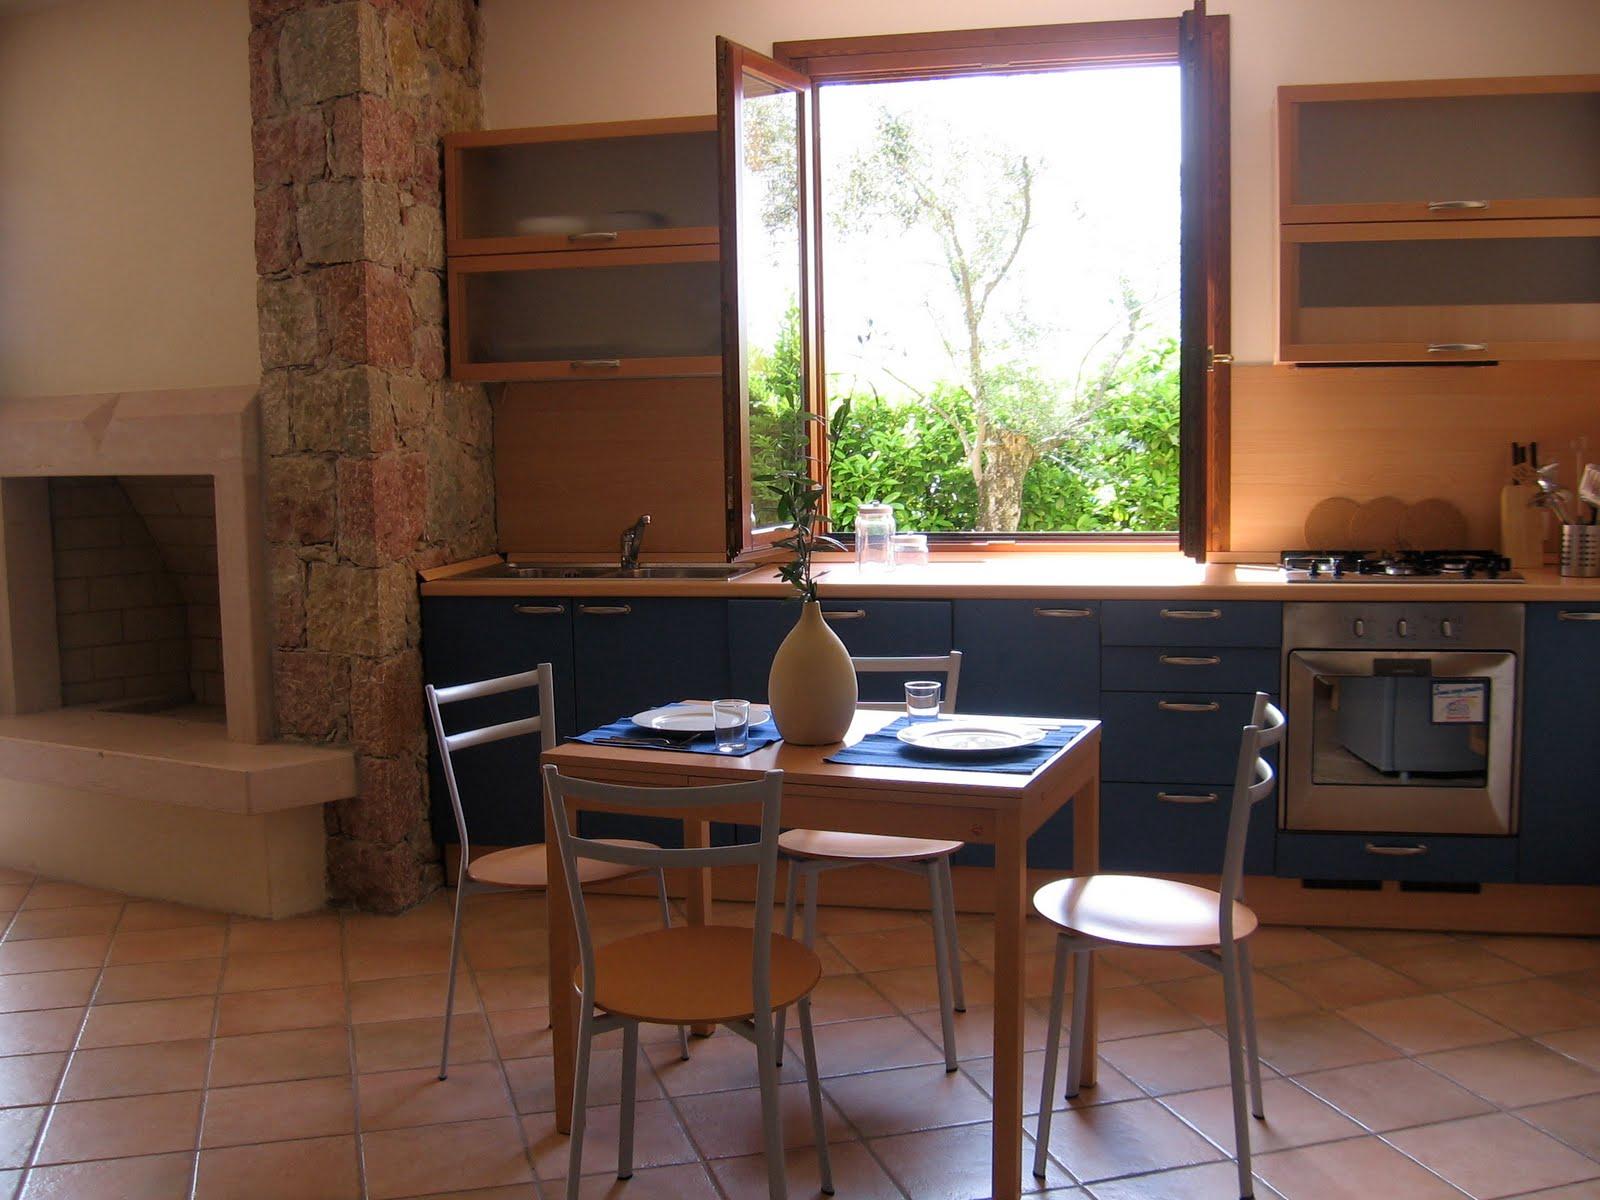 A casa di letizia la cucina - Cucine all americana foto ...